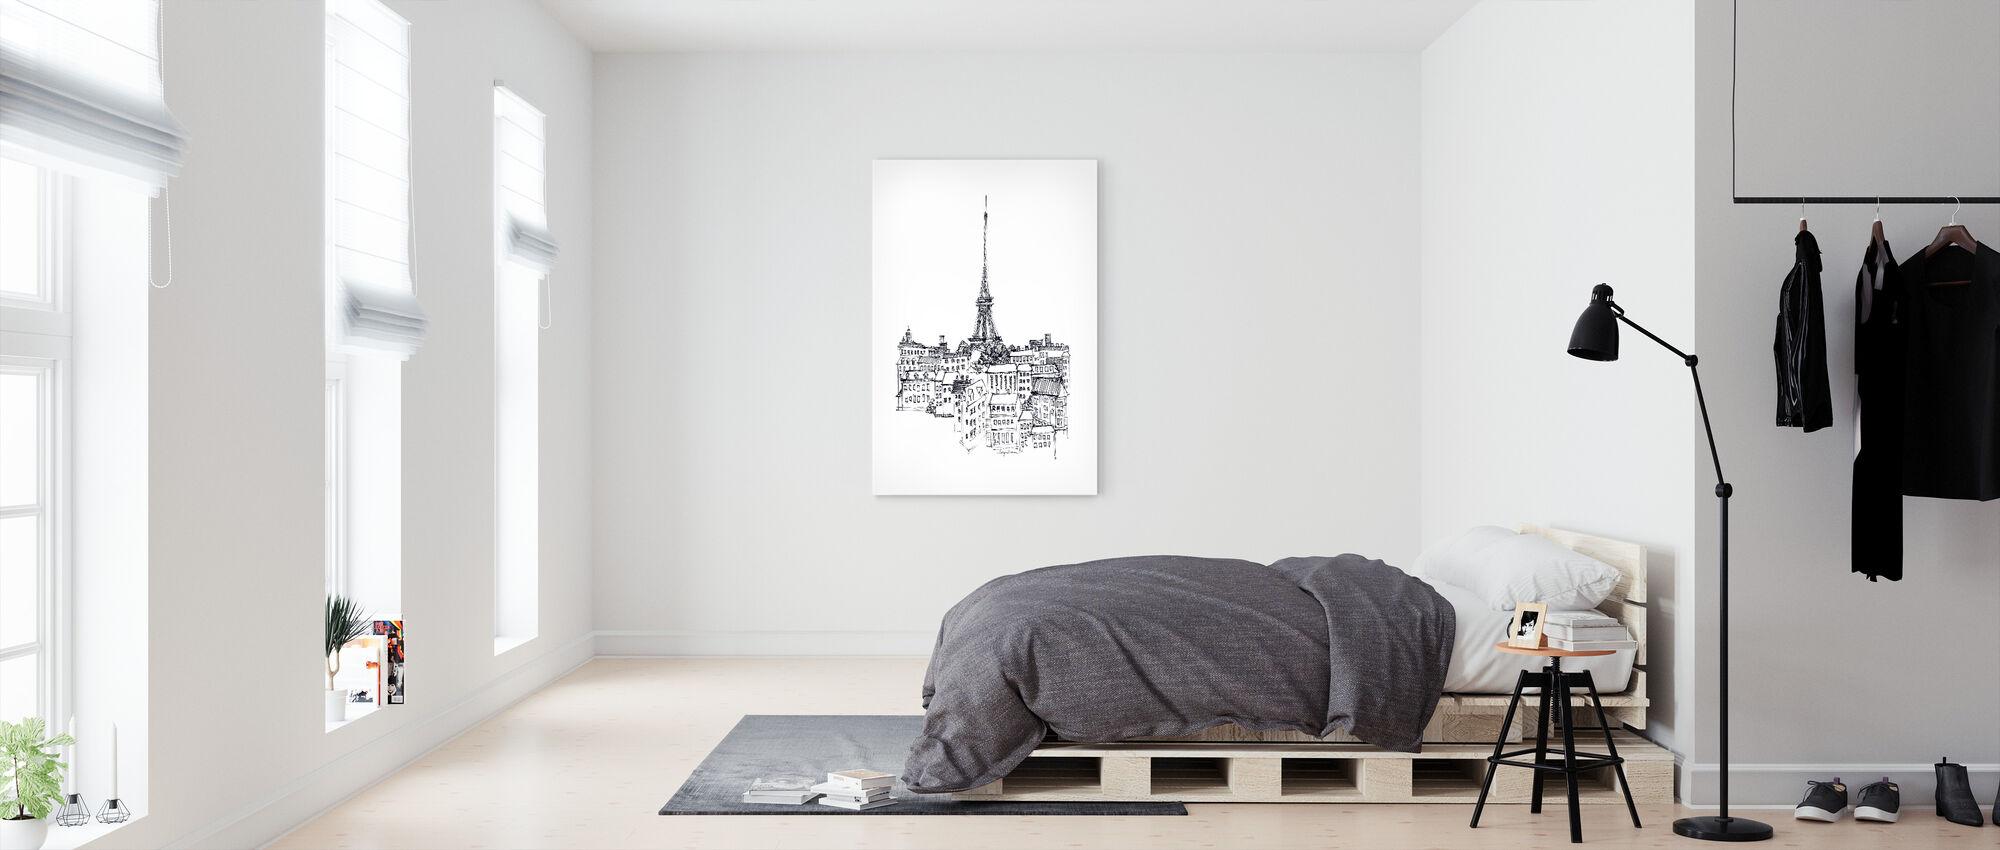 Avery Tillmon - Eiffel Tower - Canvas print - Bedroom